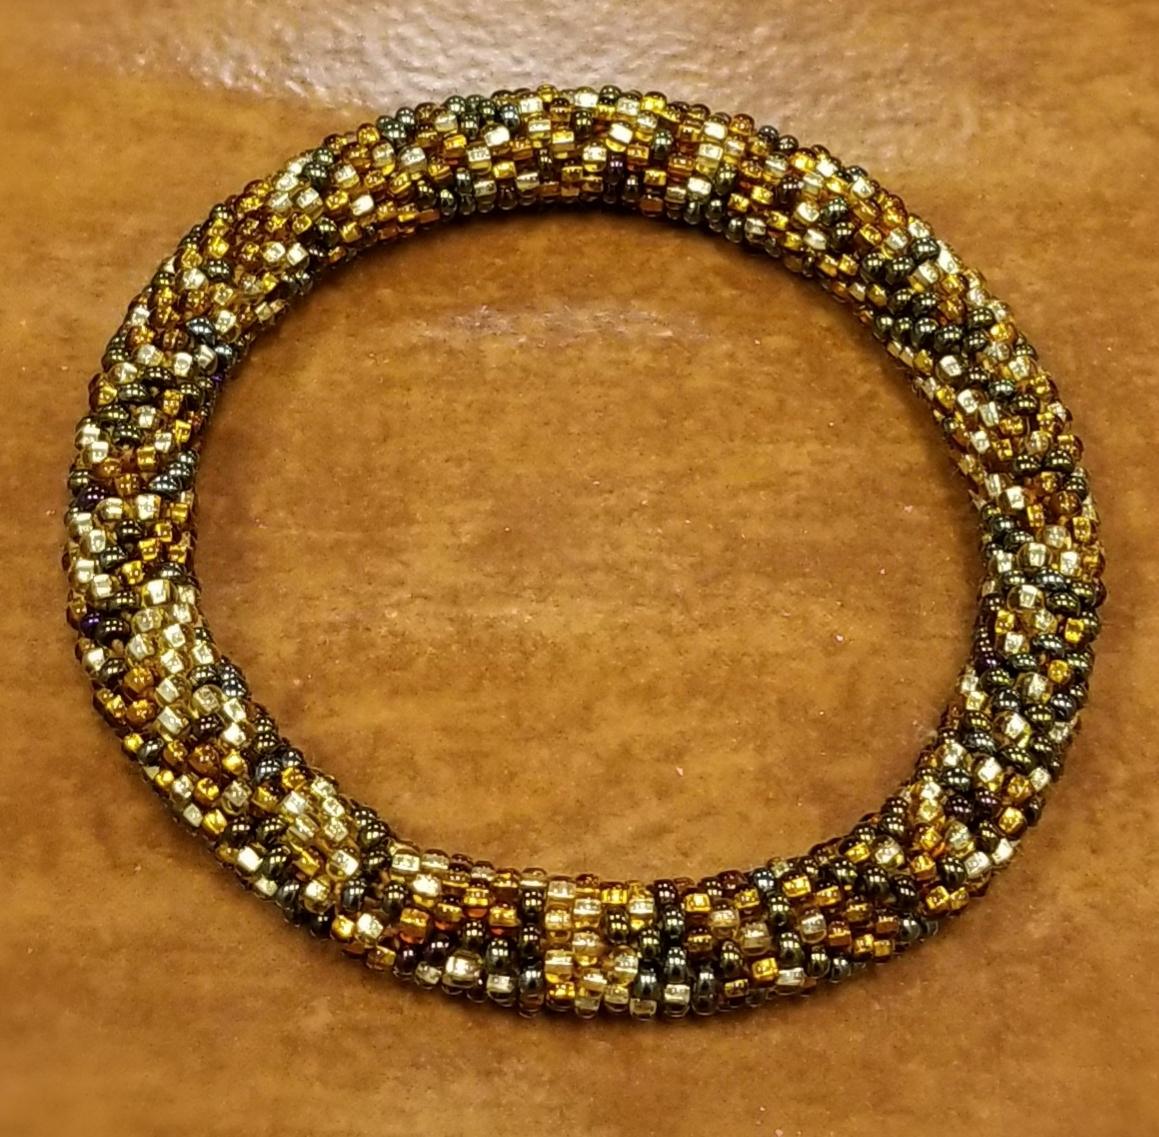 shades of brown Czech glass roll-on bracelet